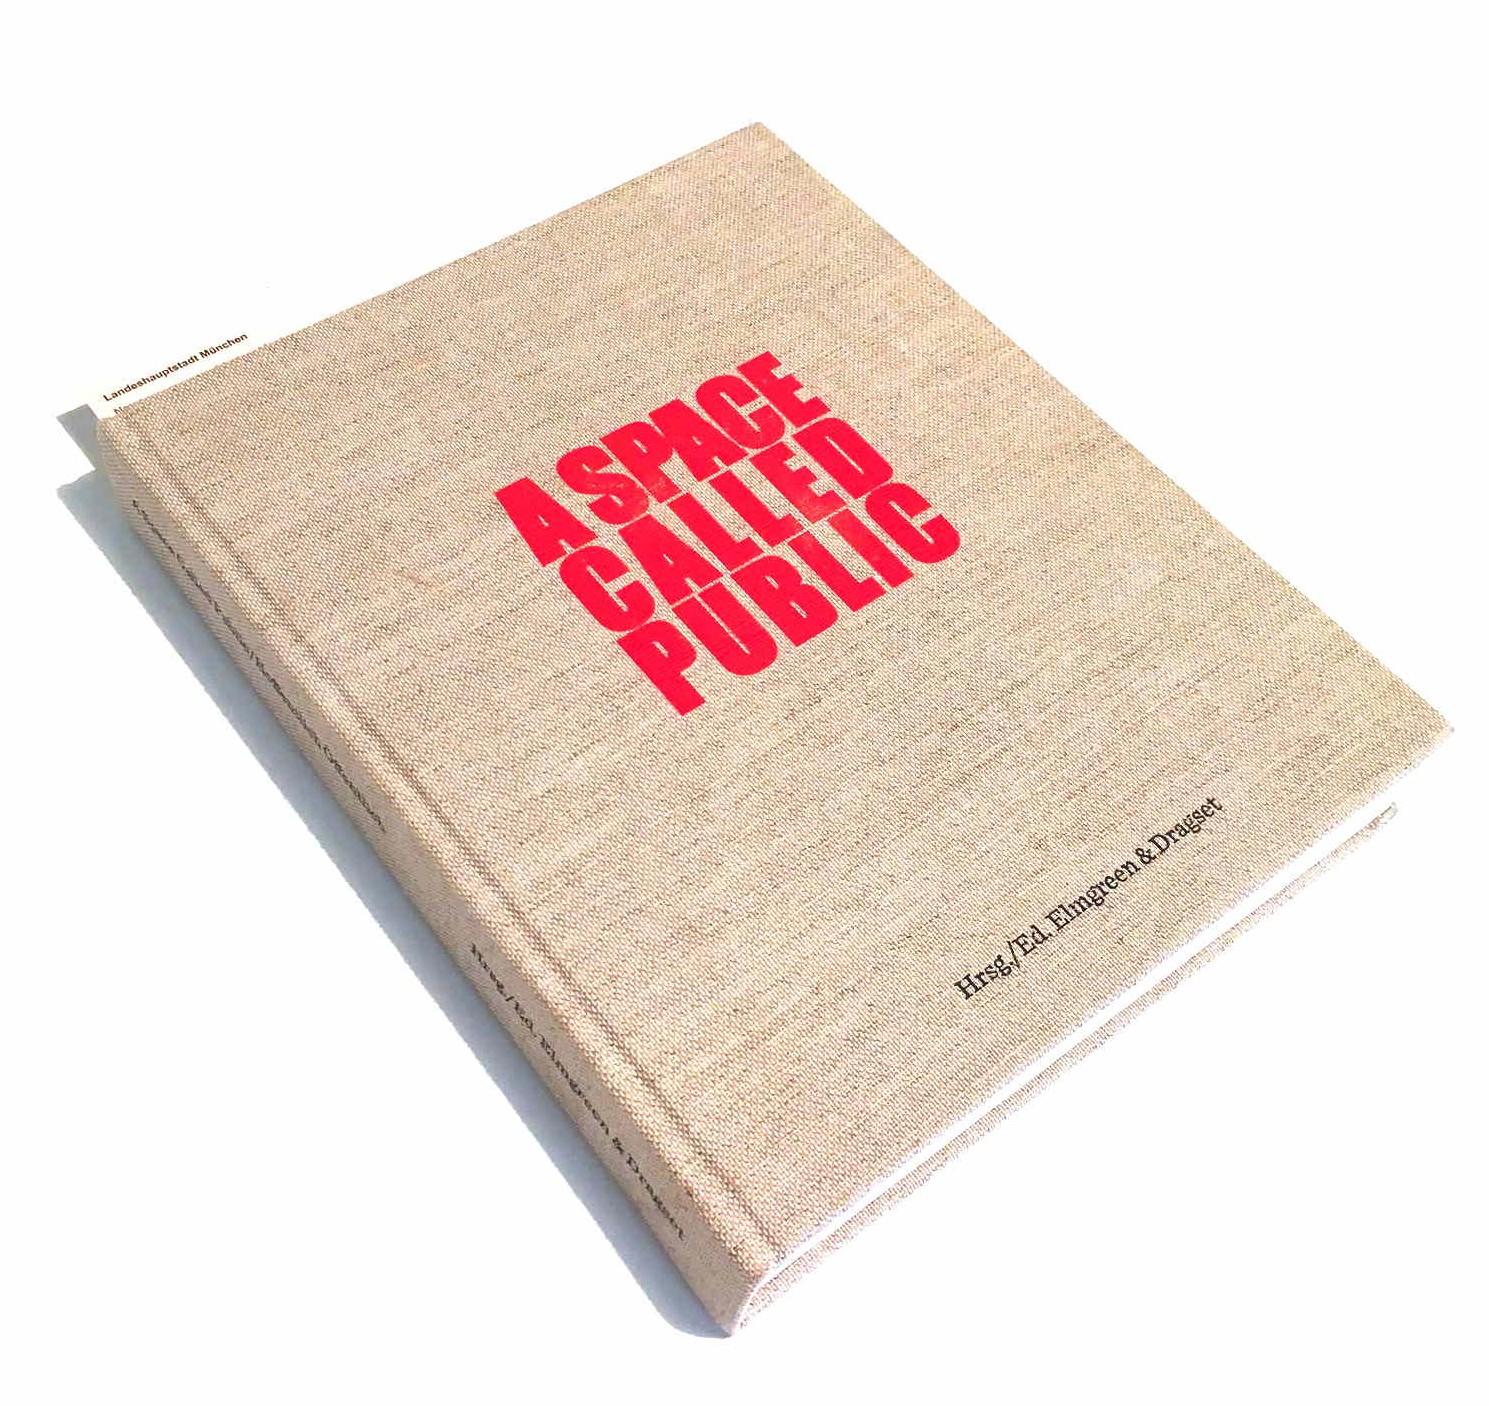 Katalog A Space Called Public